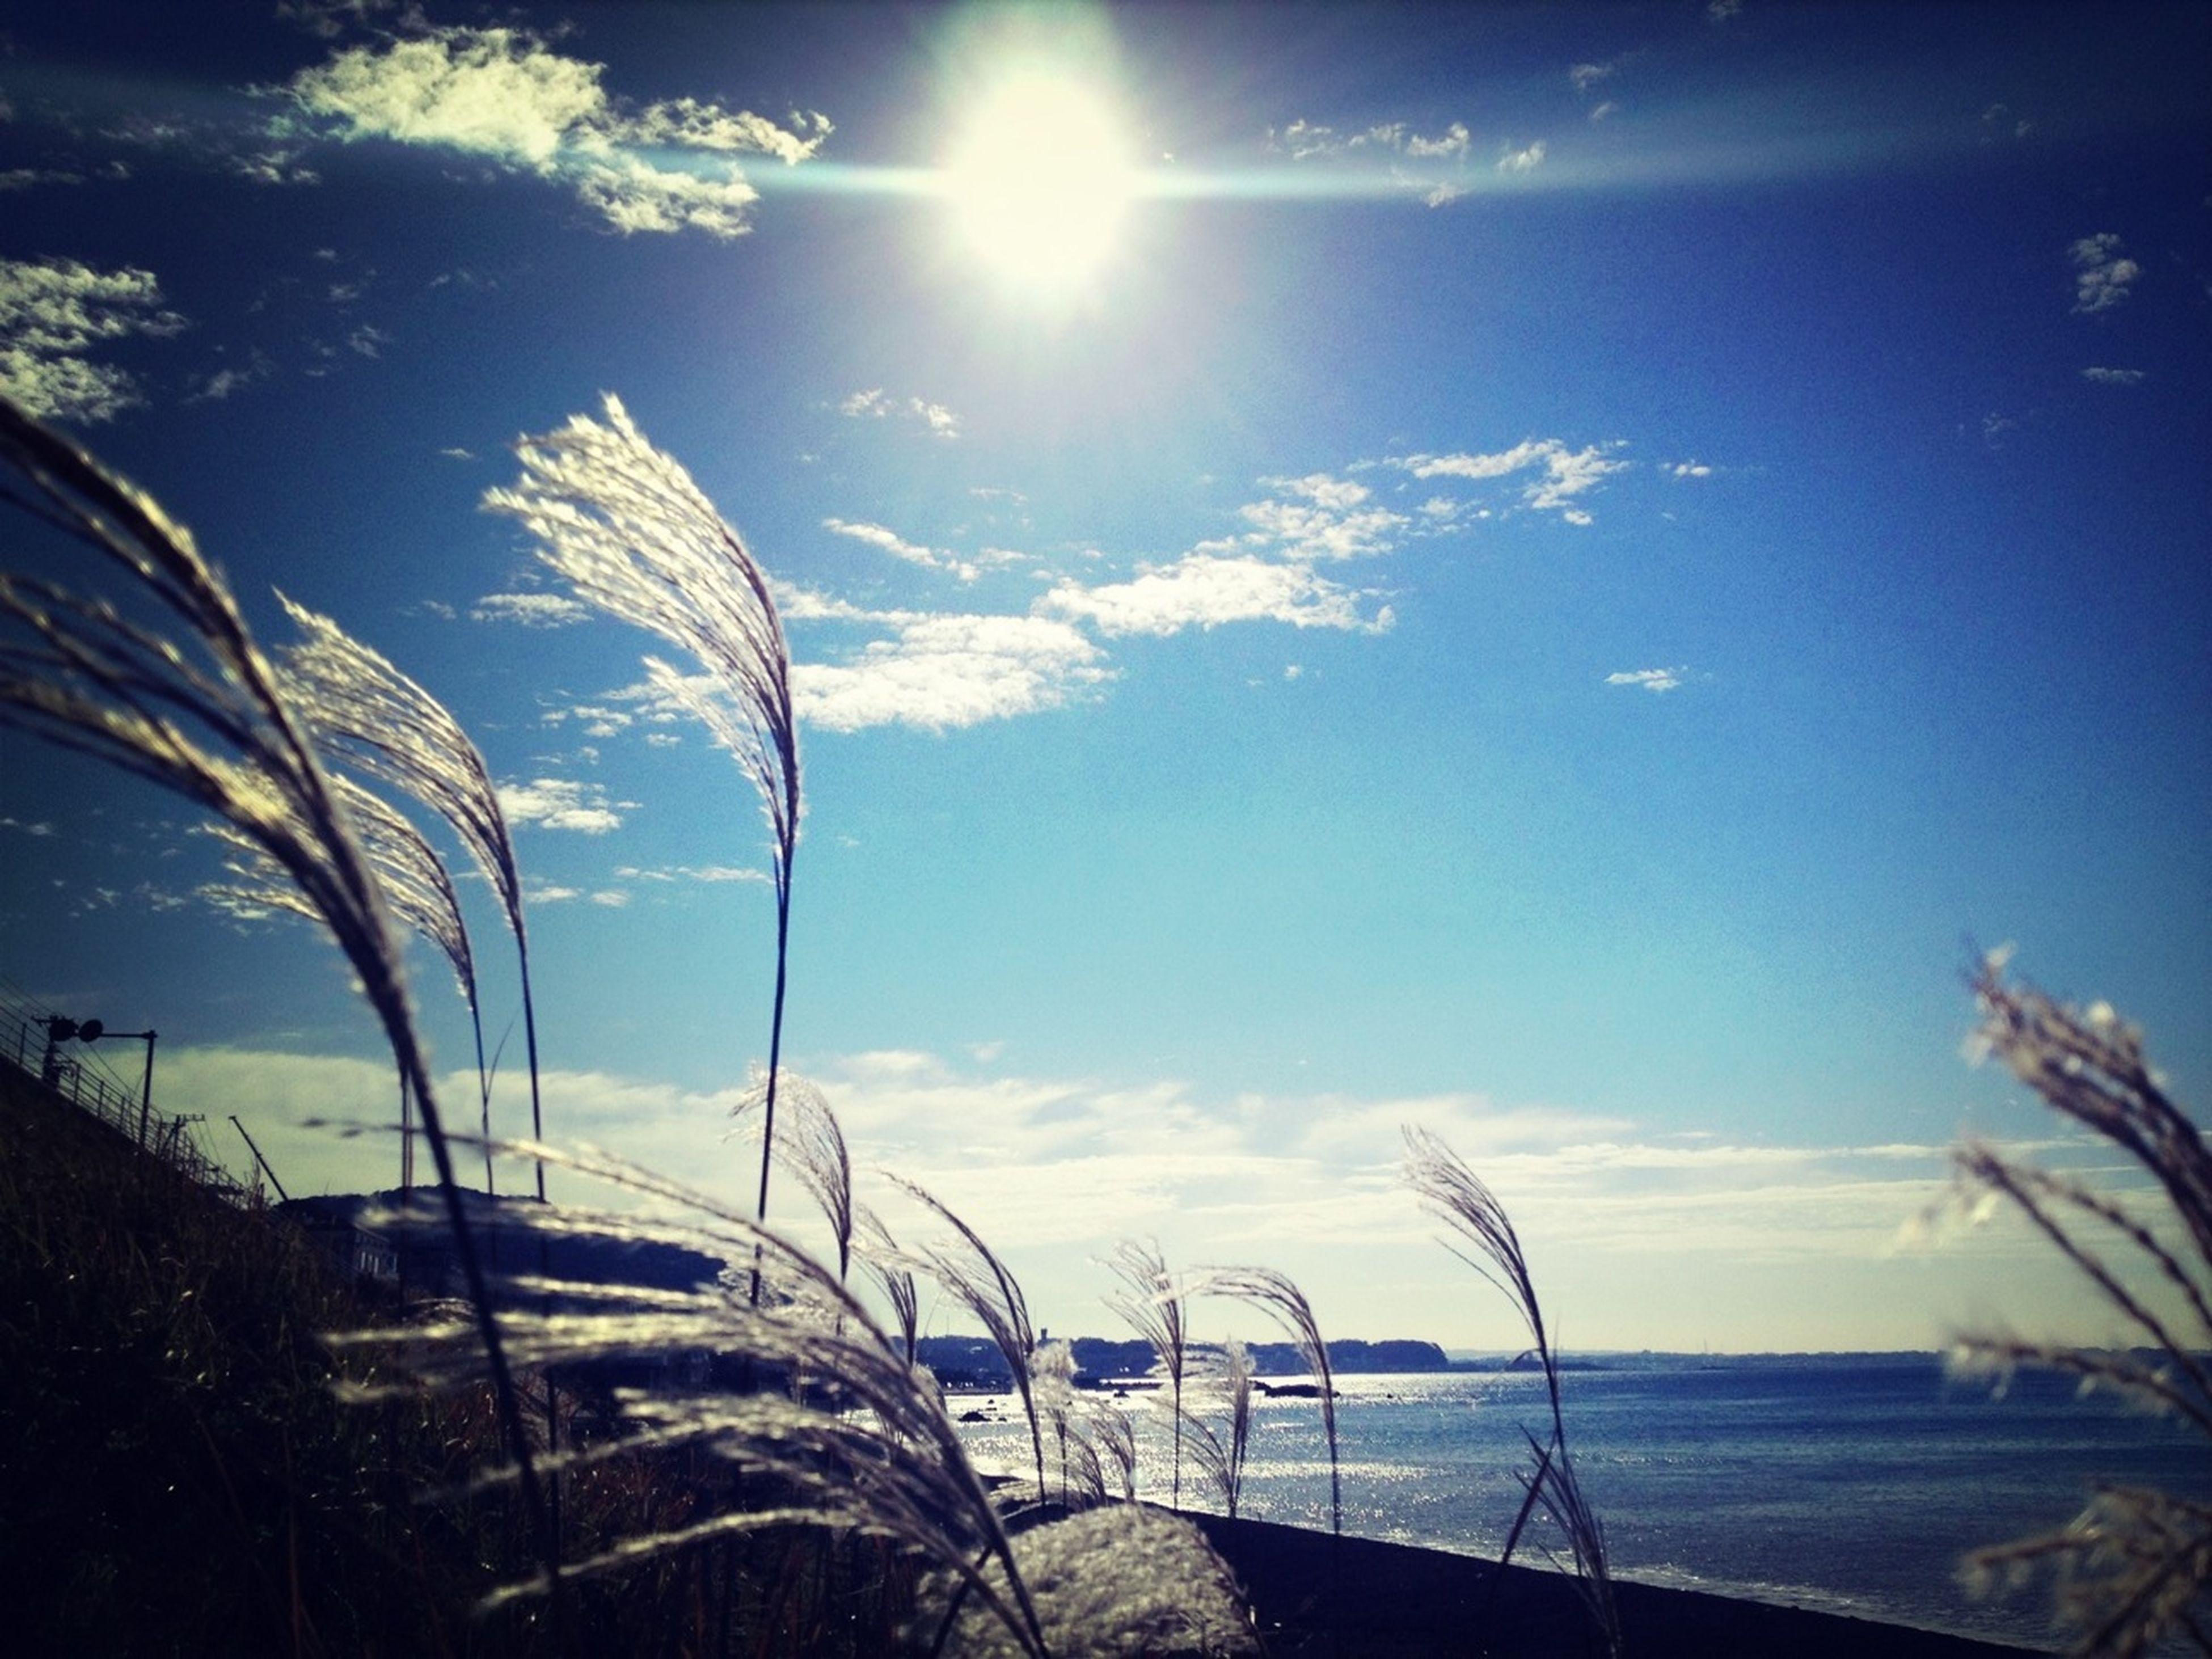 water, sea, sky, sun, tranquility, sunlight, tranquil scene, sunbeam, beach, scenics, nature, beauty in nature, horizon over water, blue, lens flare, shore, sunny, idyllic, cloud - sky, day